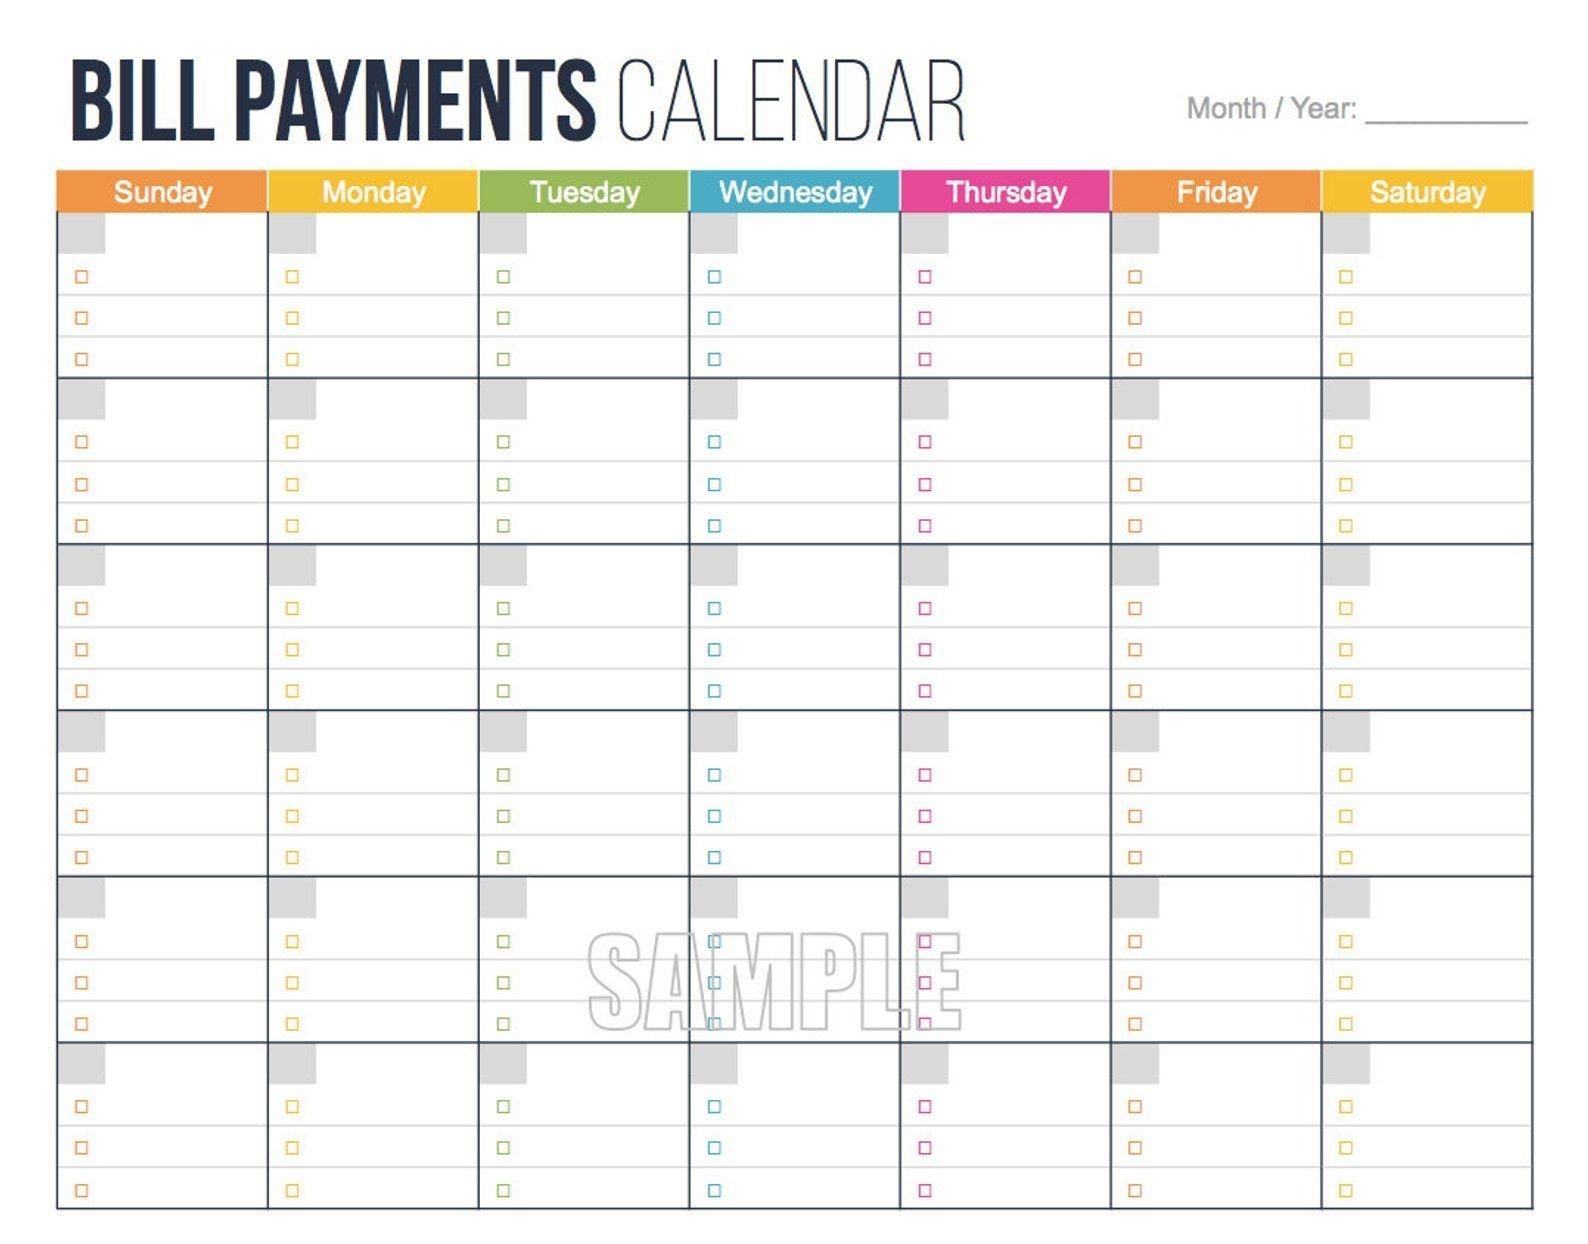 Bill Payments Calendar - Personal Finance Organizing  Monthly Payment Calendar Pdf